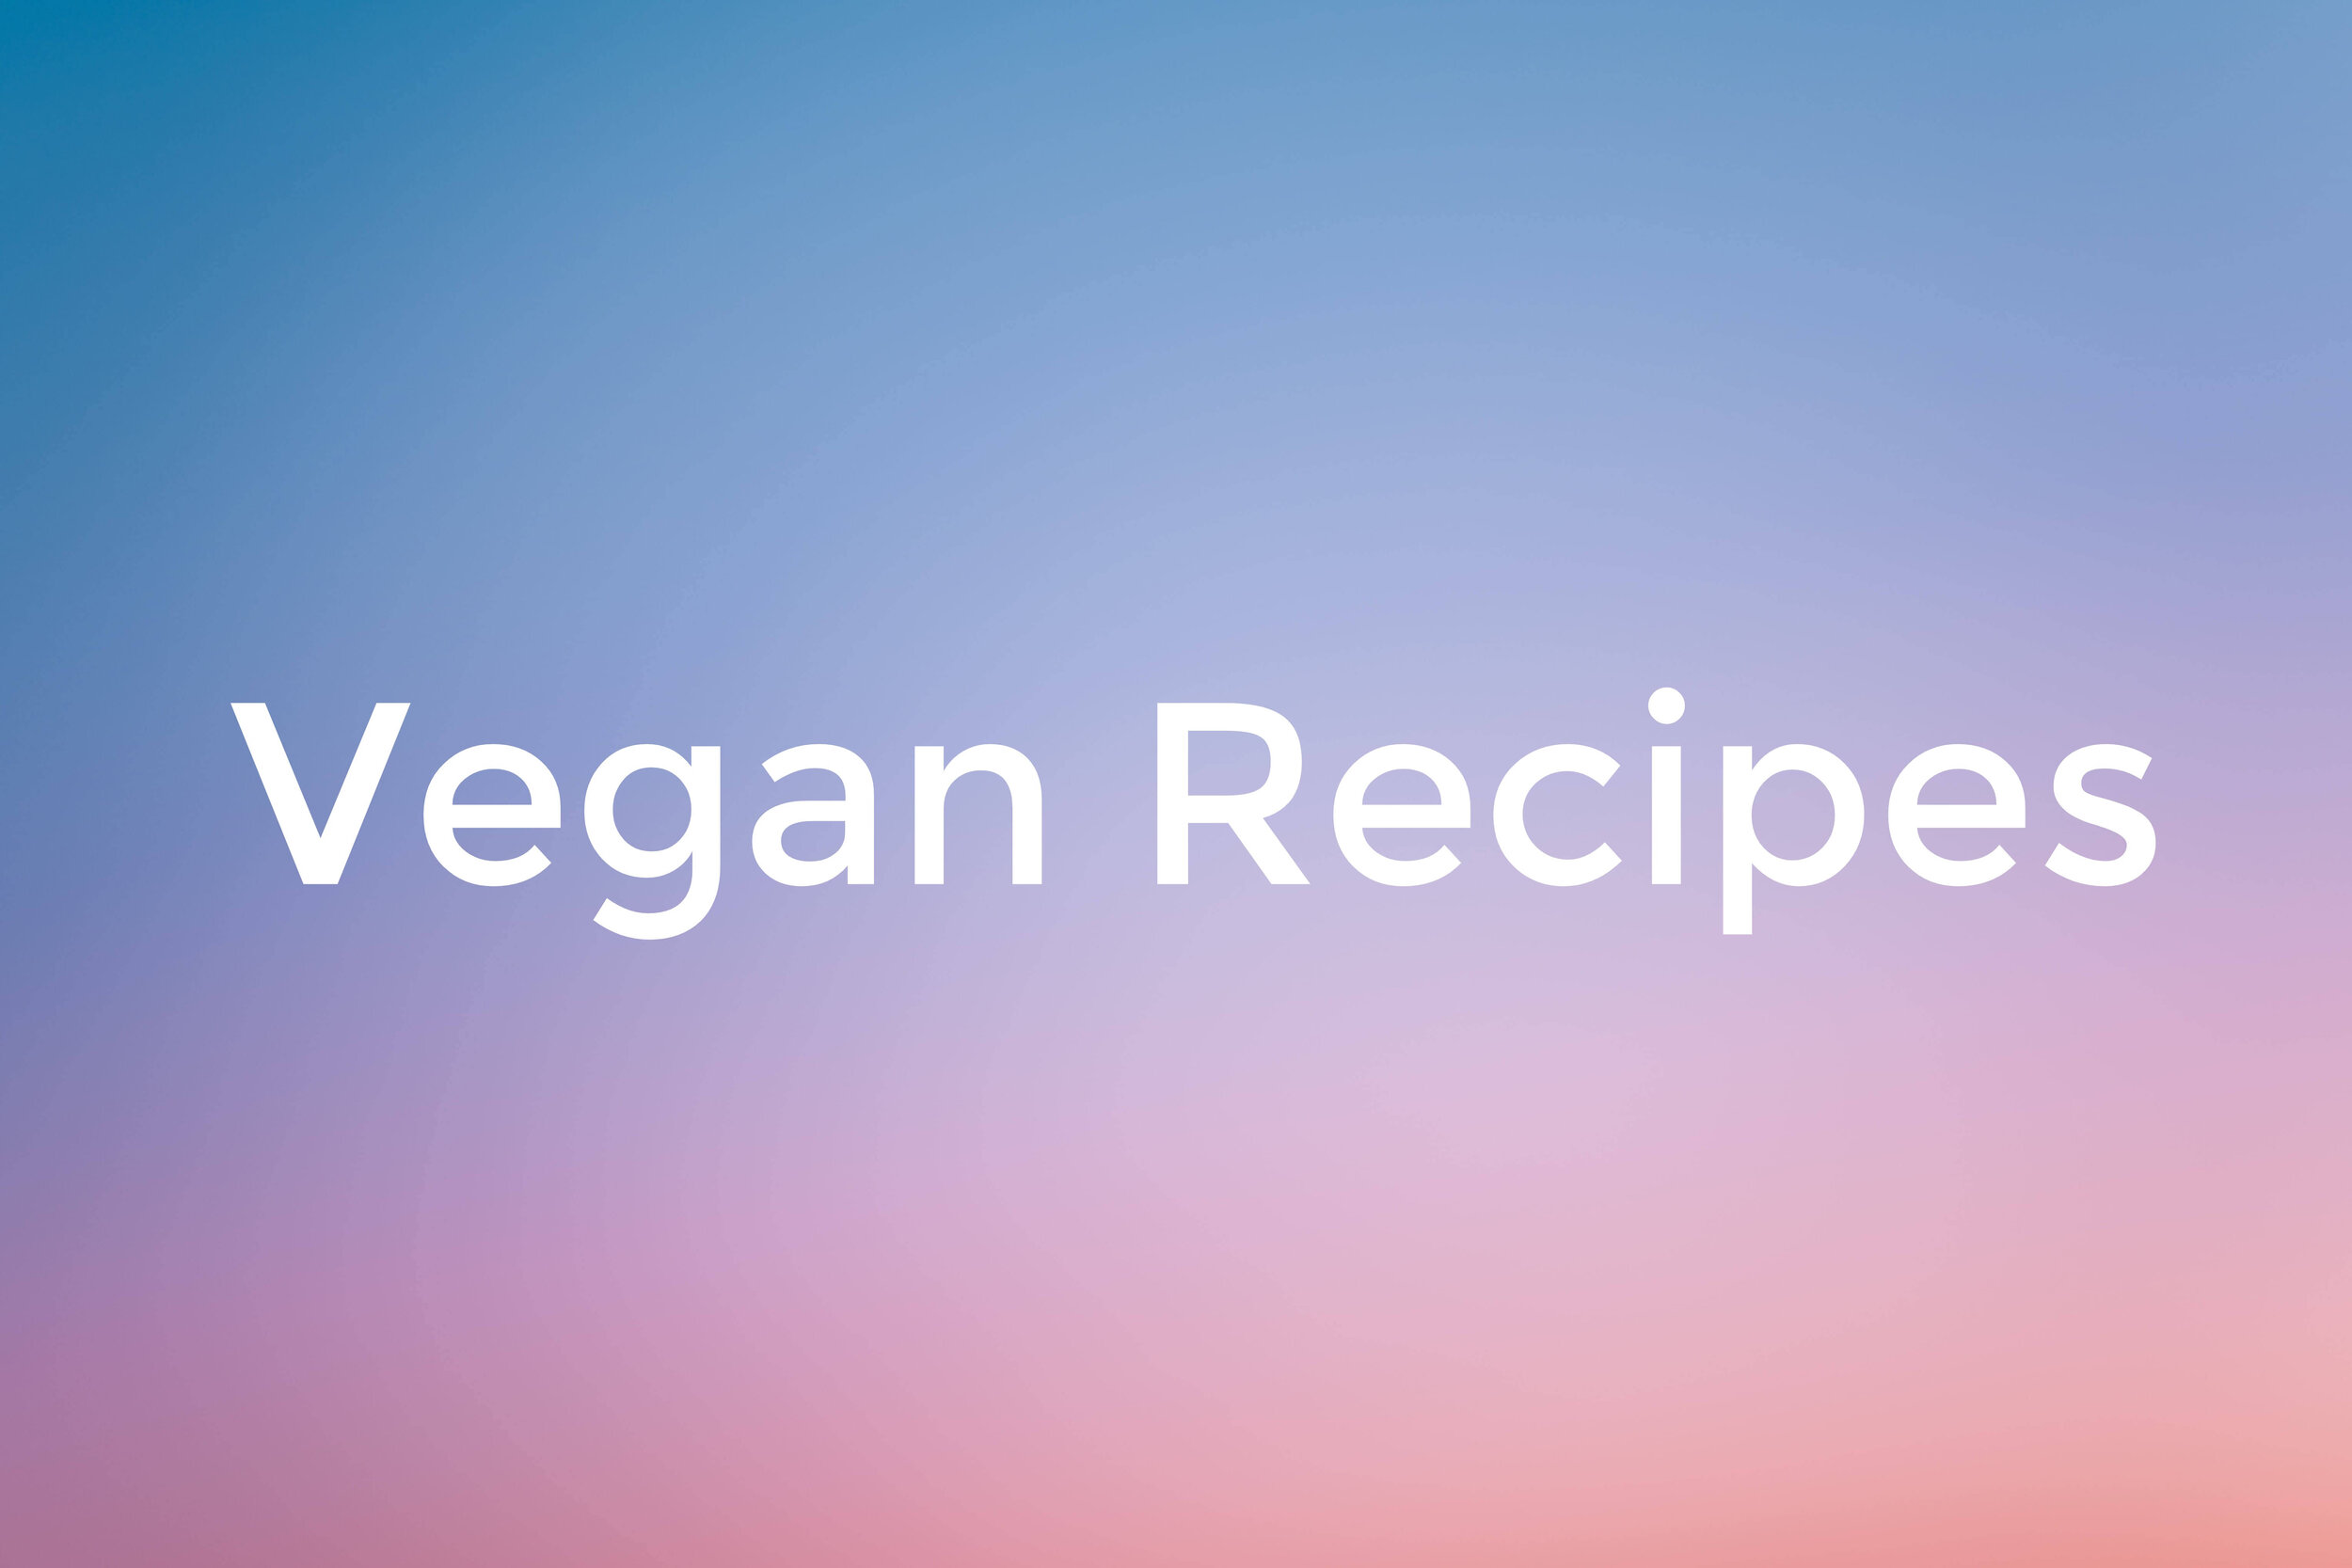 best vegan recipes on the internet